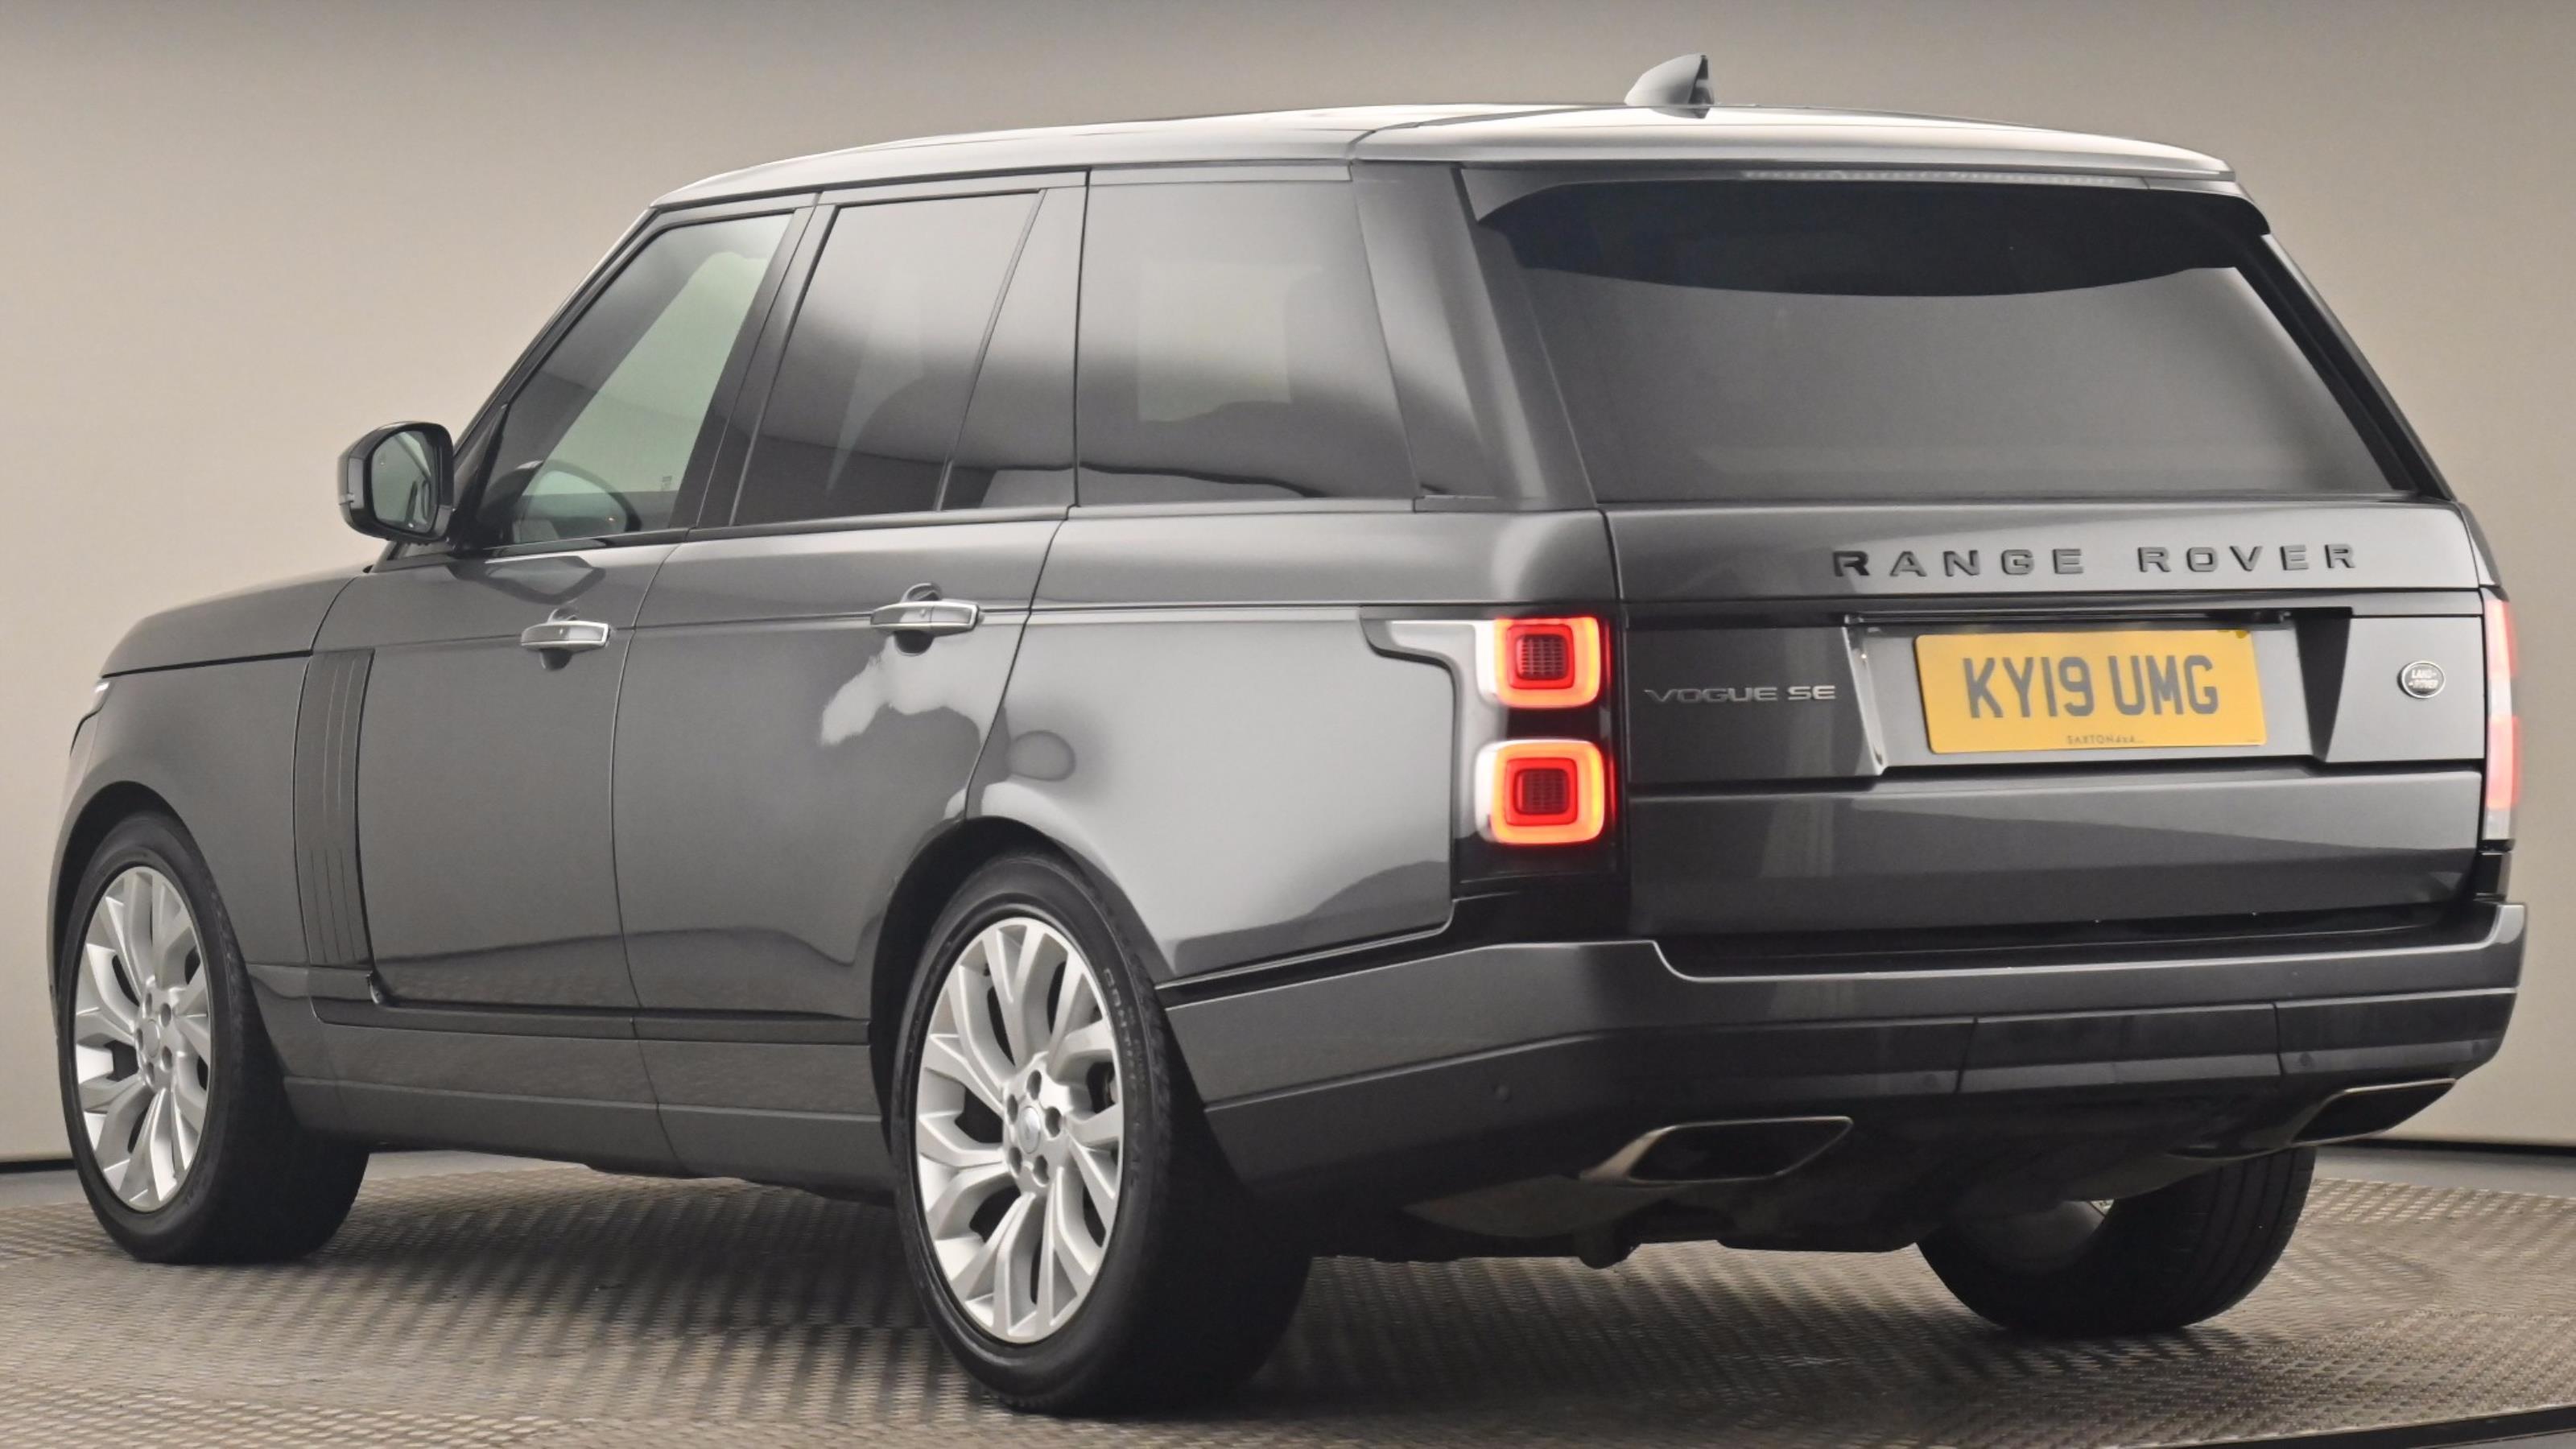 Used 2019 Land Rover RANGE ROVER 3.0 SDV6 Vogue SE 4dr Auto GREY at Saxton4x4